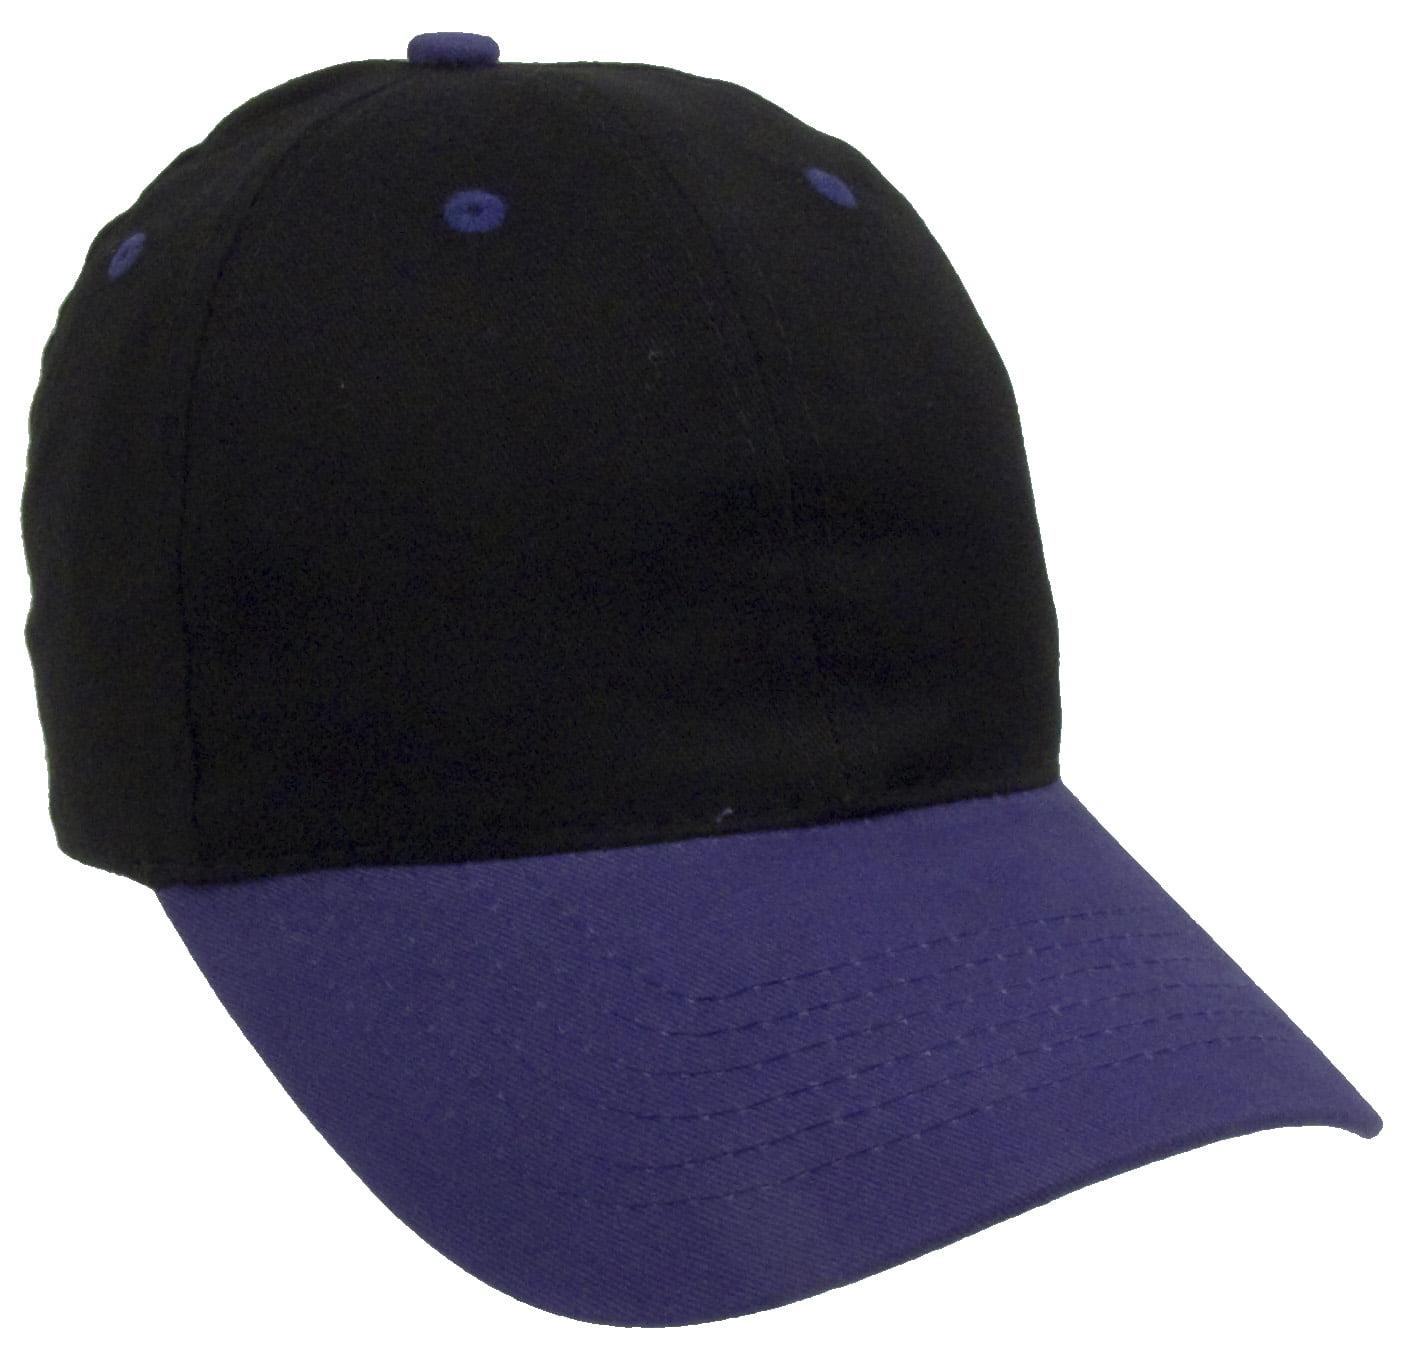 7089c091d98b0 Two Tone Plain Baseball Cap Unstructured Blank Hats - Walmart.com